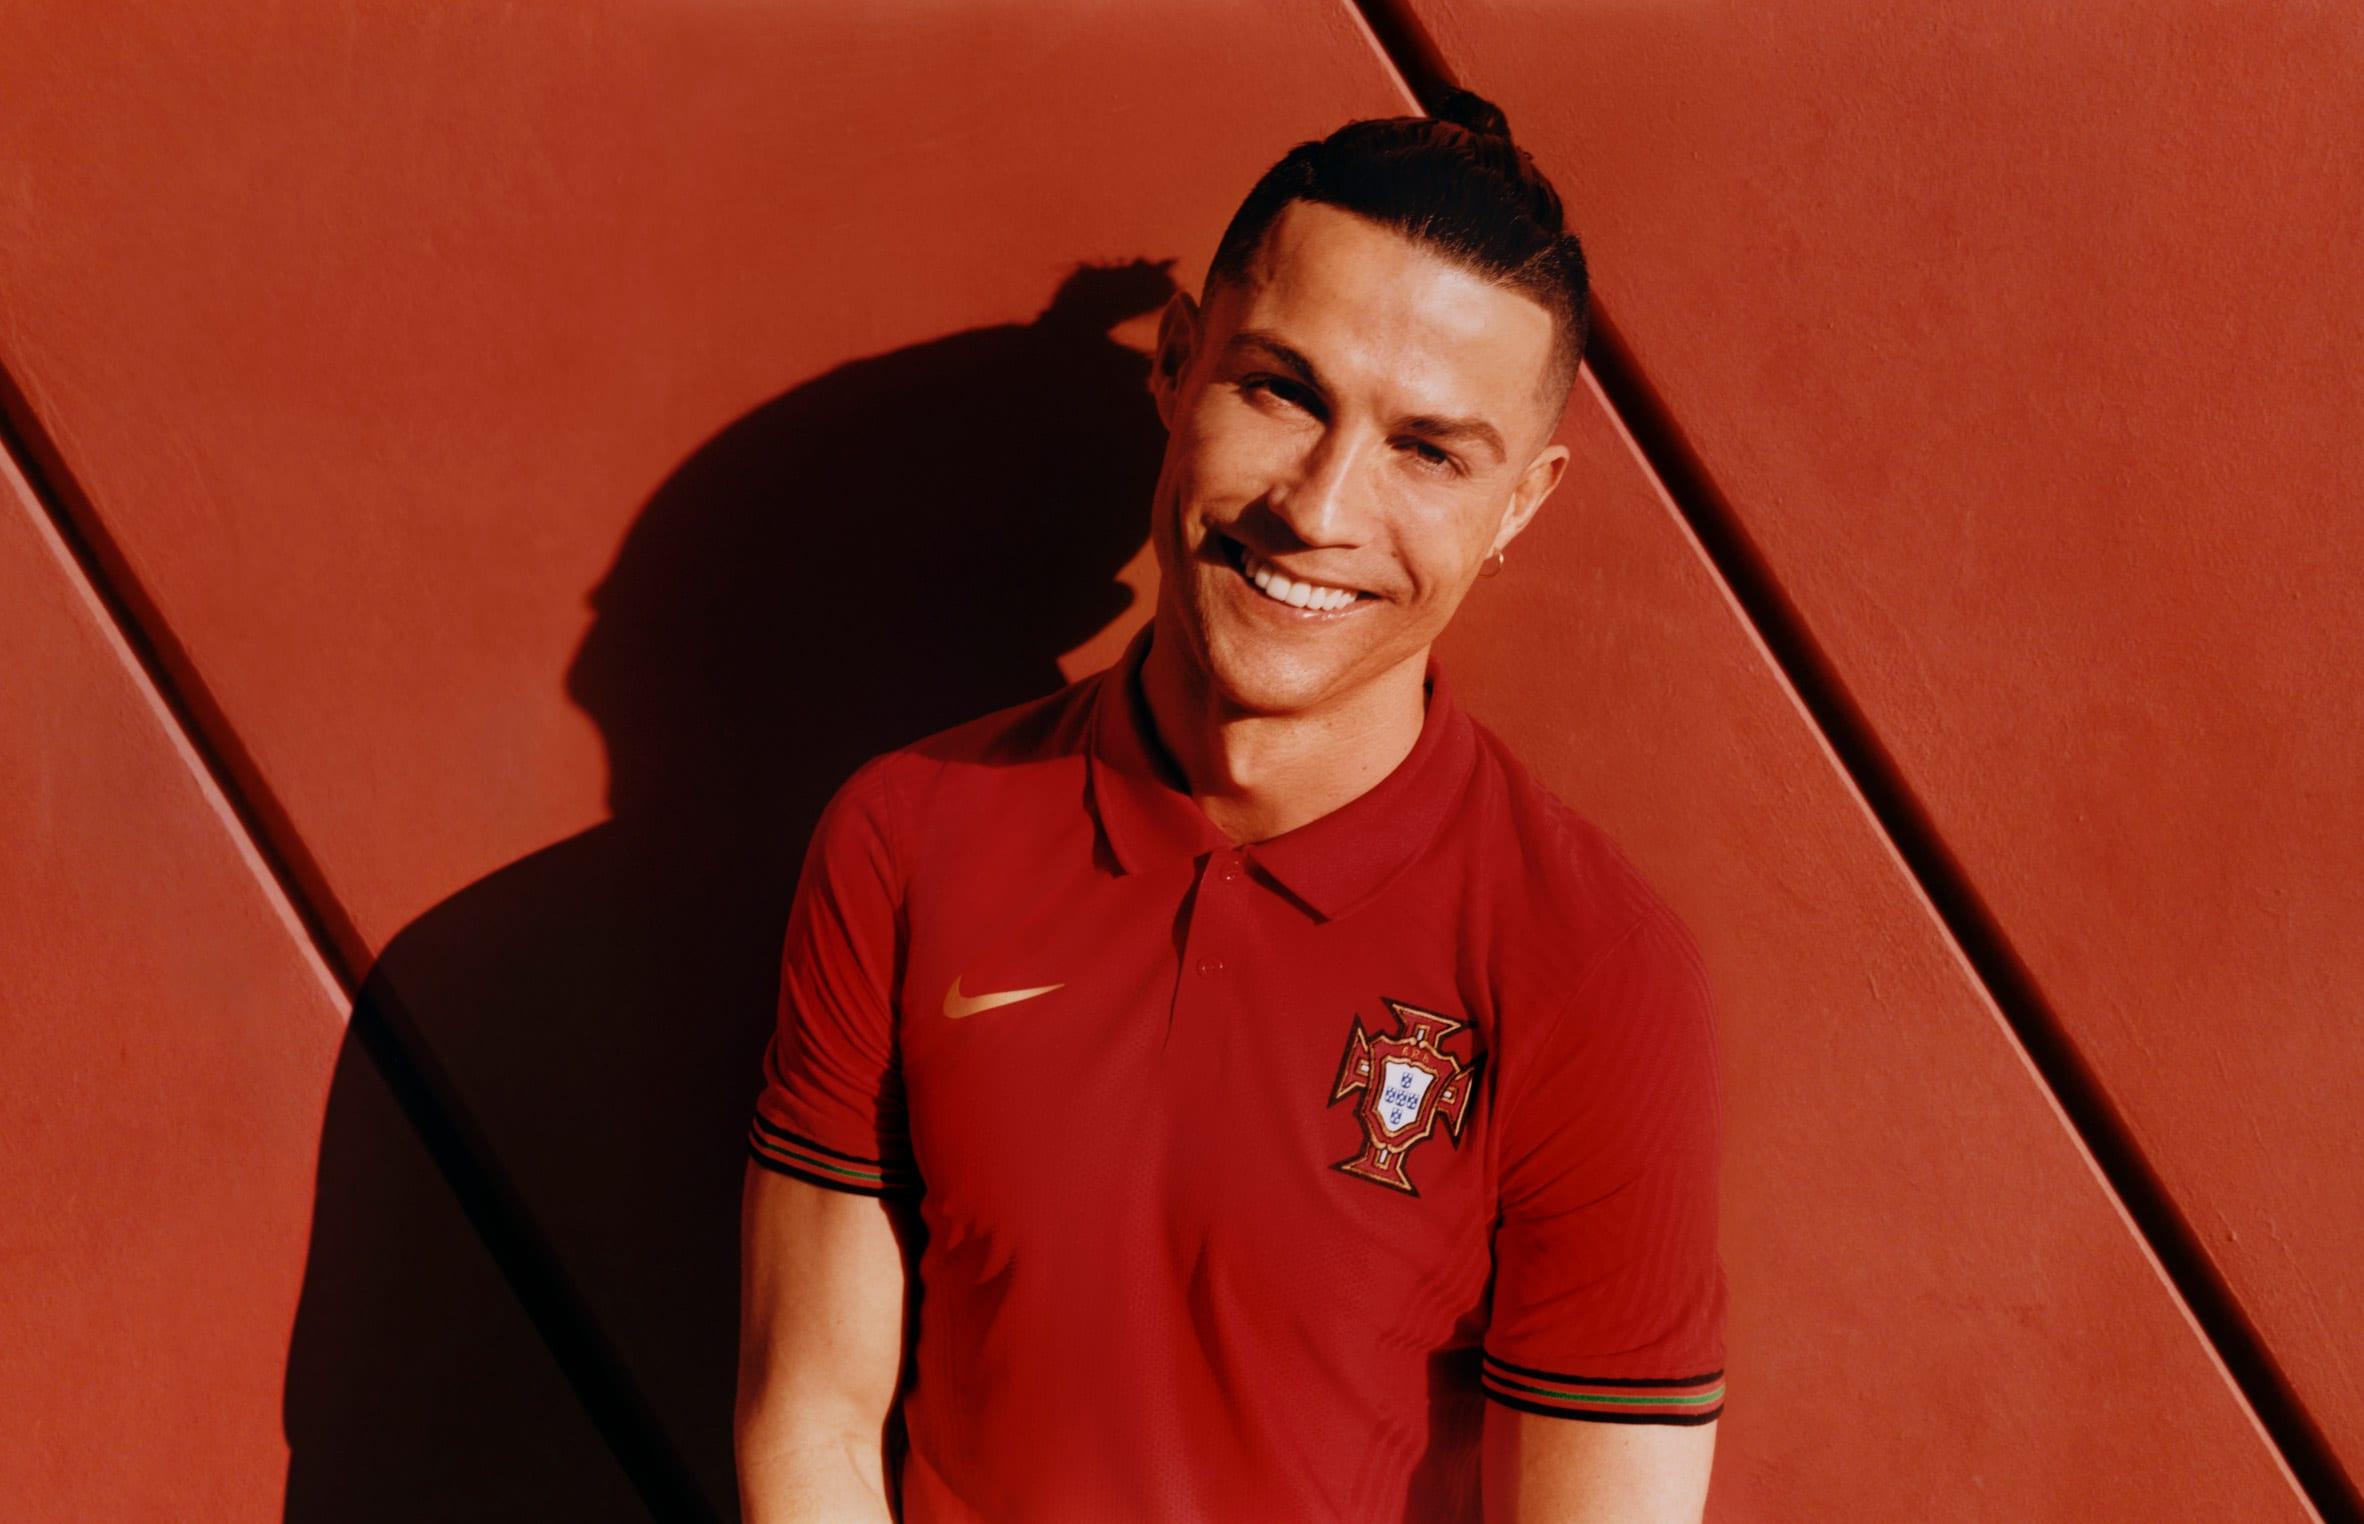 Cristiano Ronaldo in Portugal kit